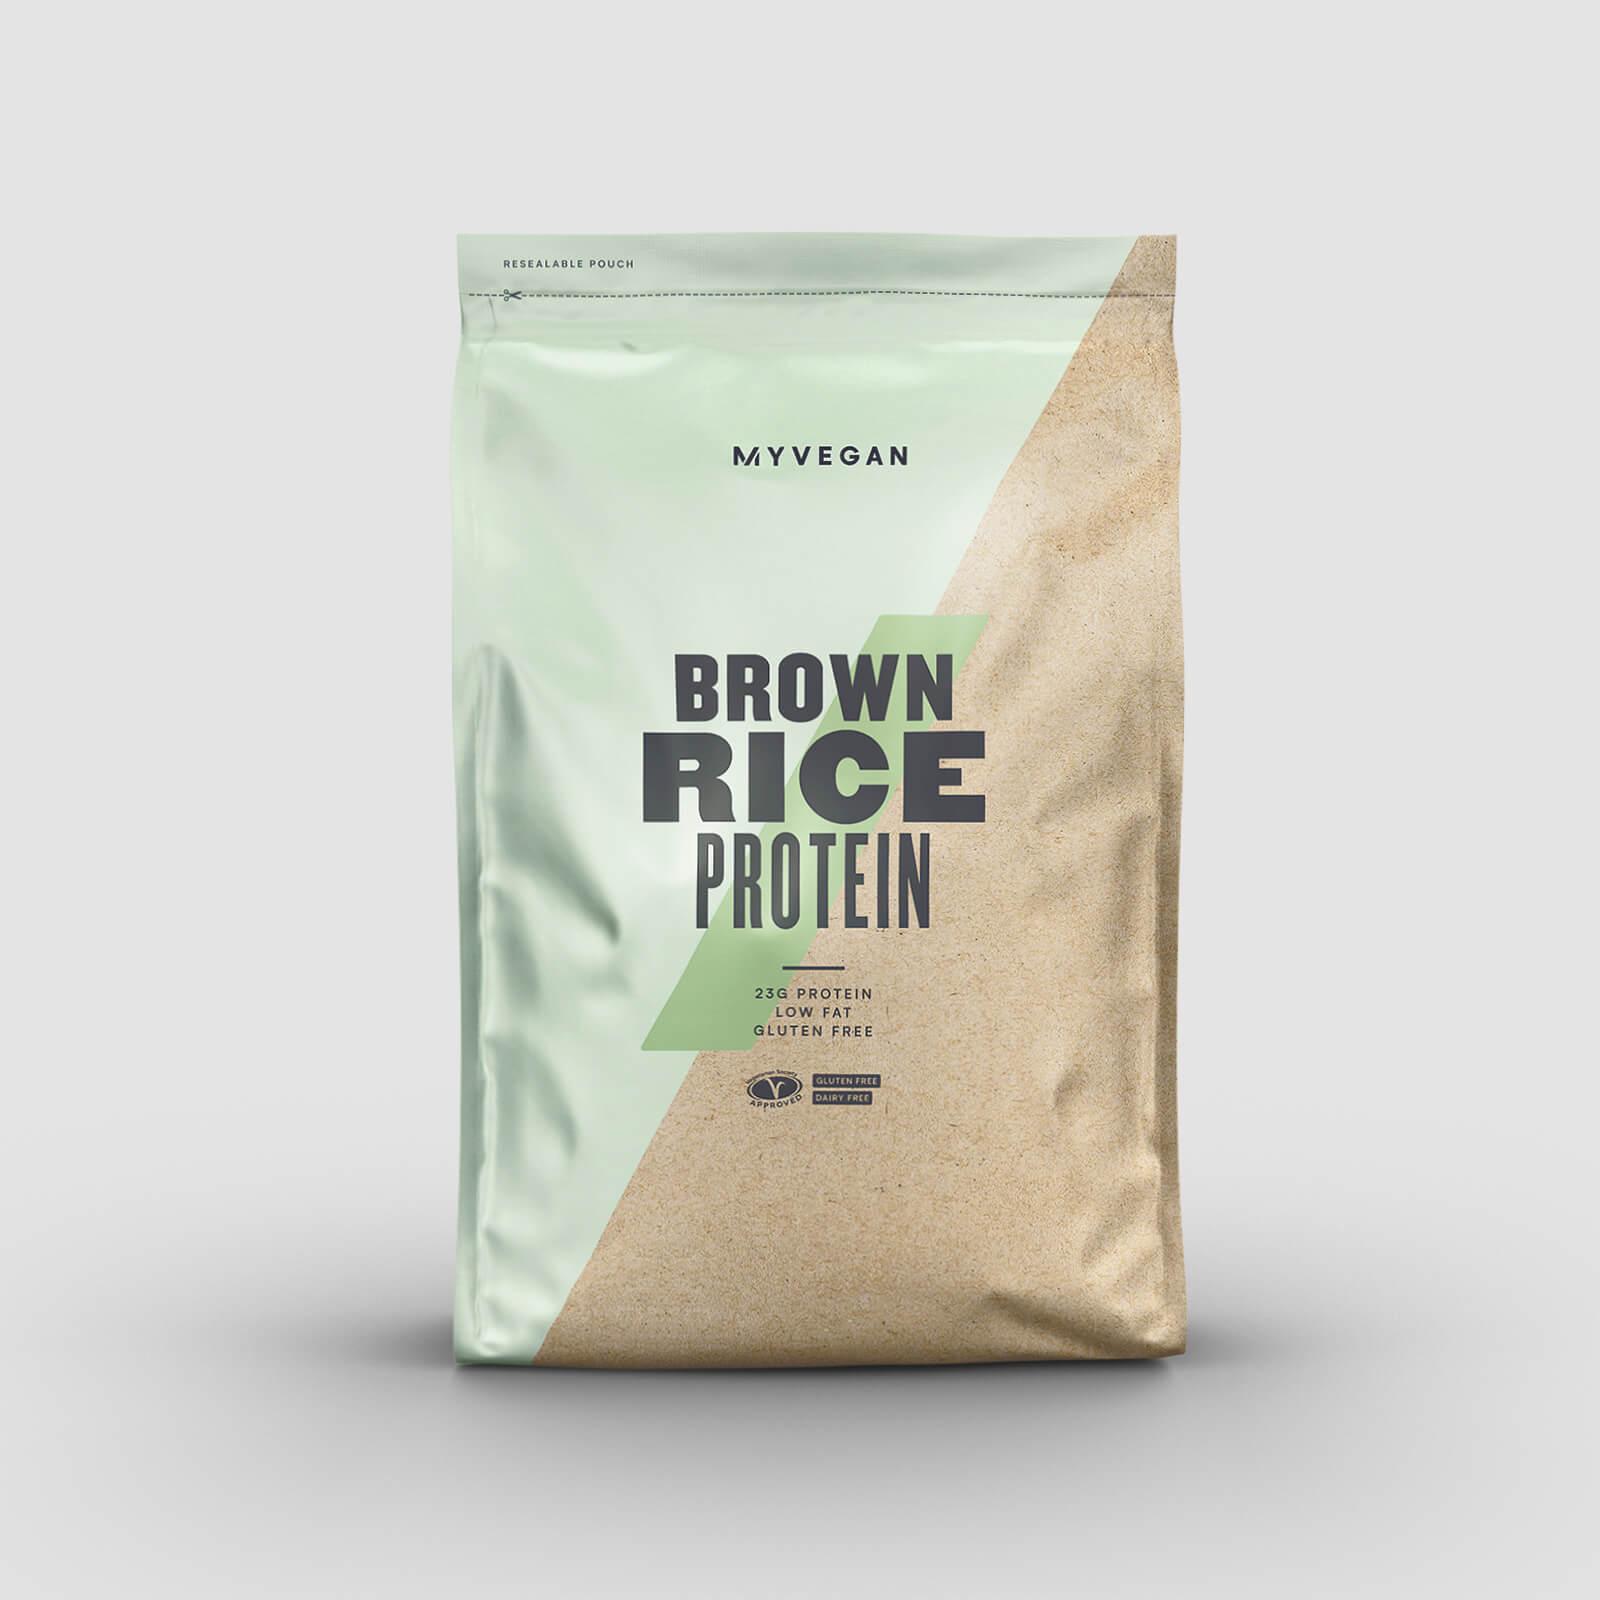 Myprotein Brown Rice Protein - 5.5lb - Vanilla Stevia